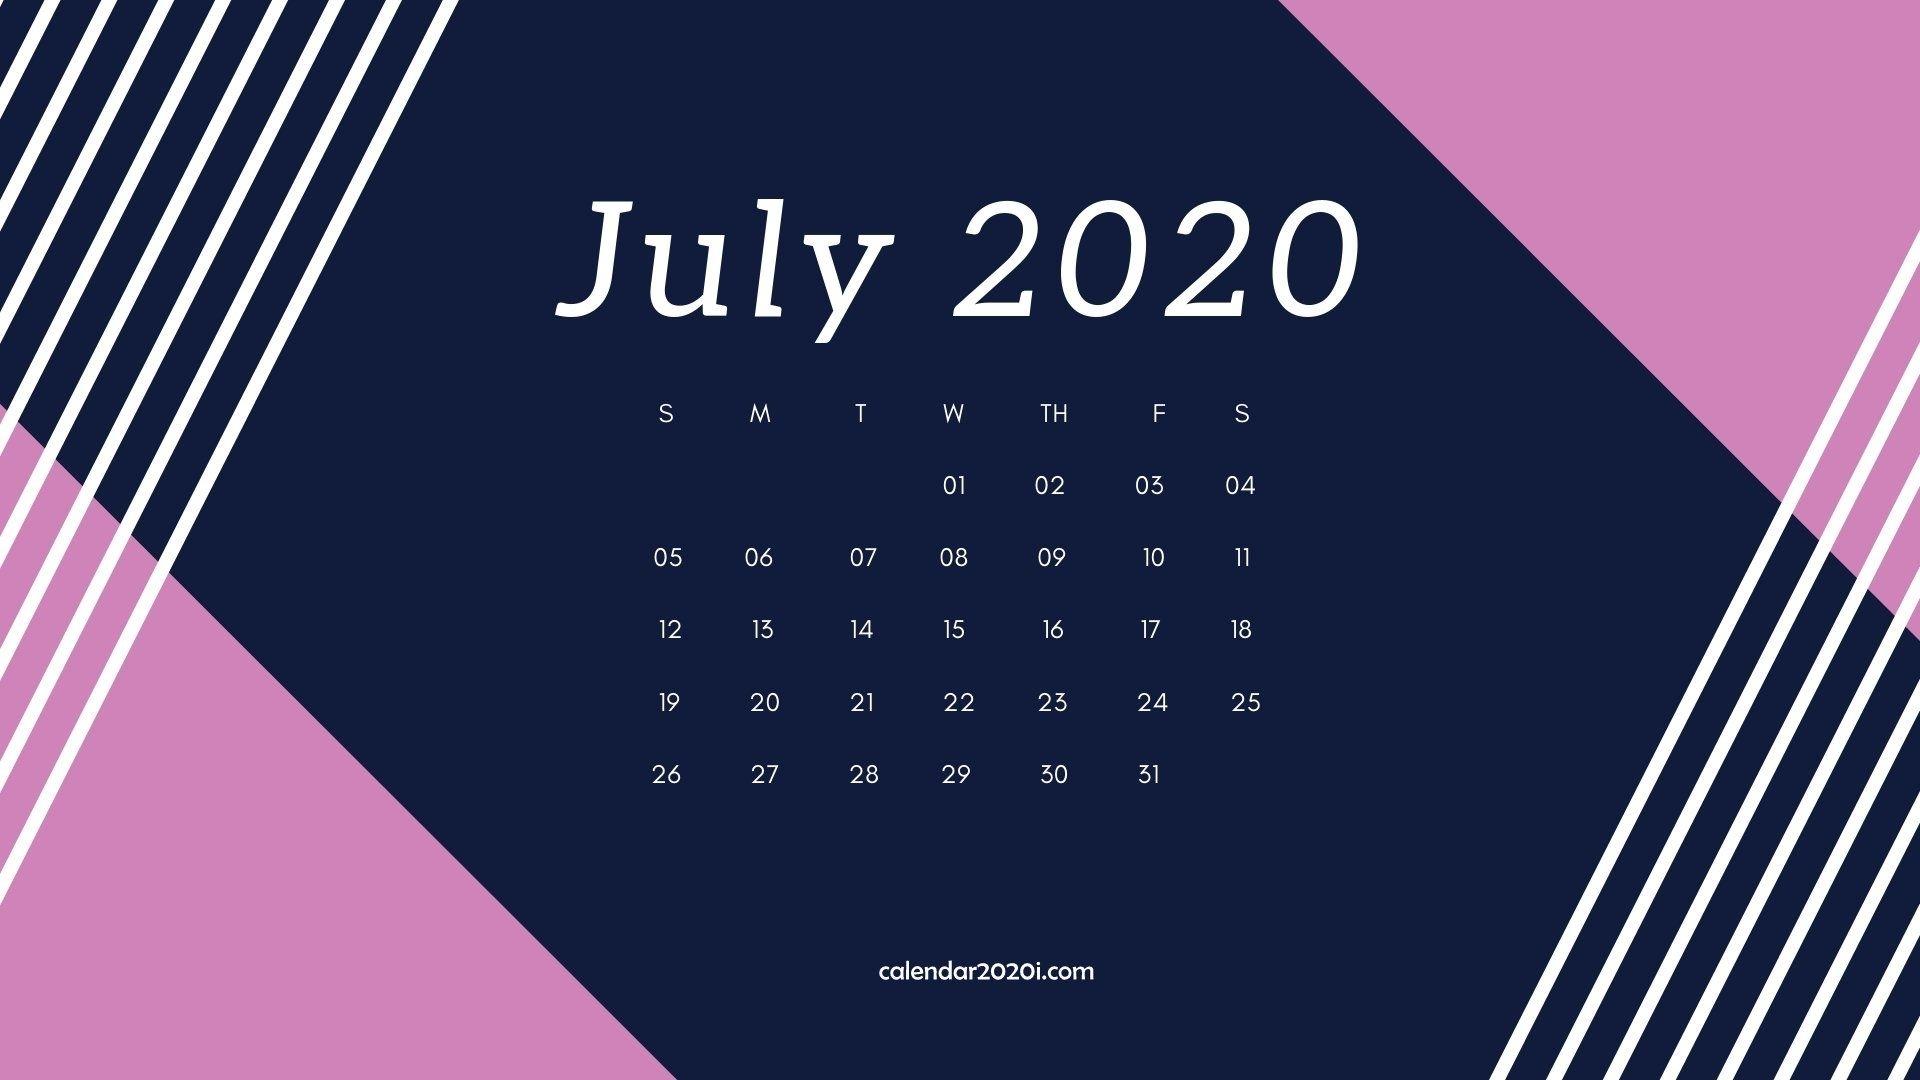 July 2020 Calendar Desktop Wallpaper In 2019 | Calendar